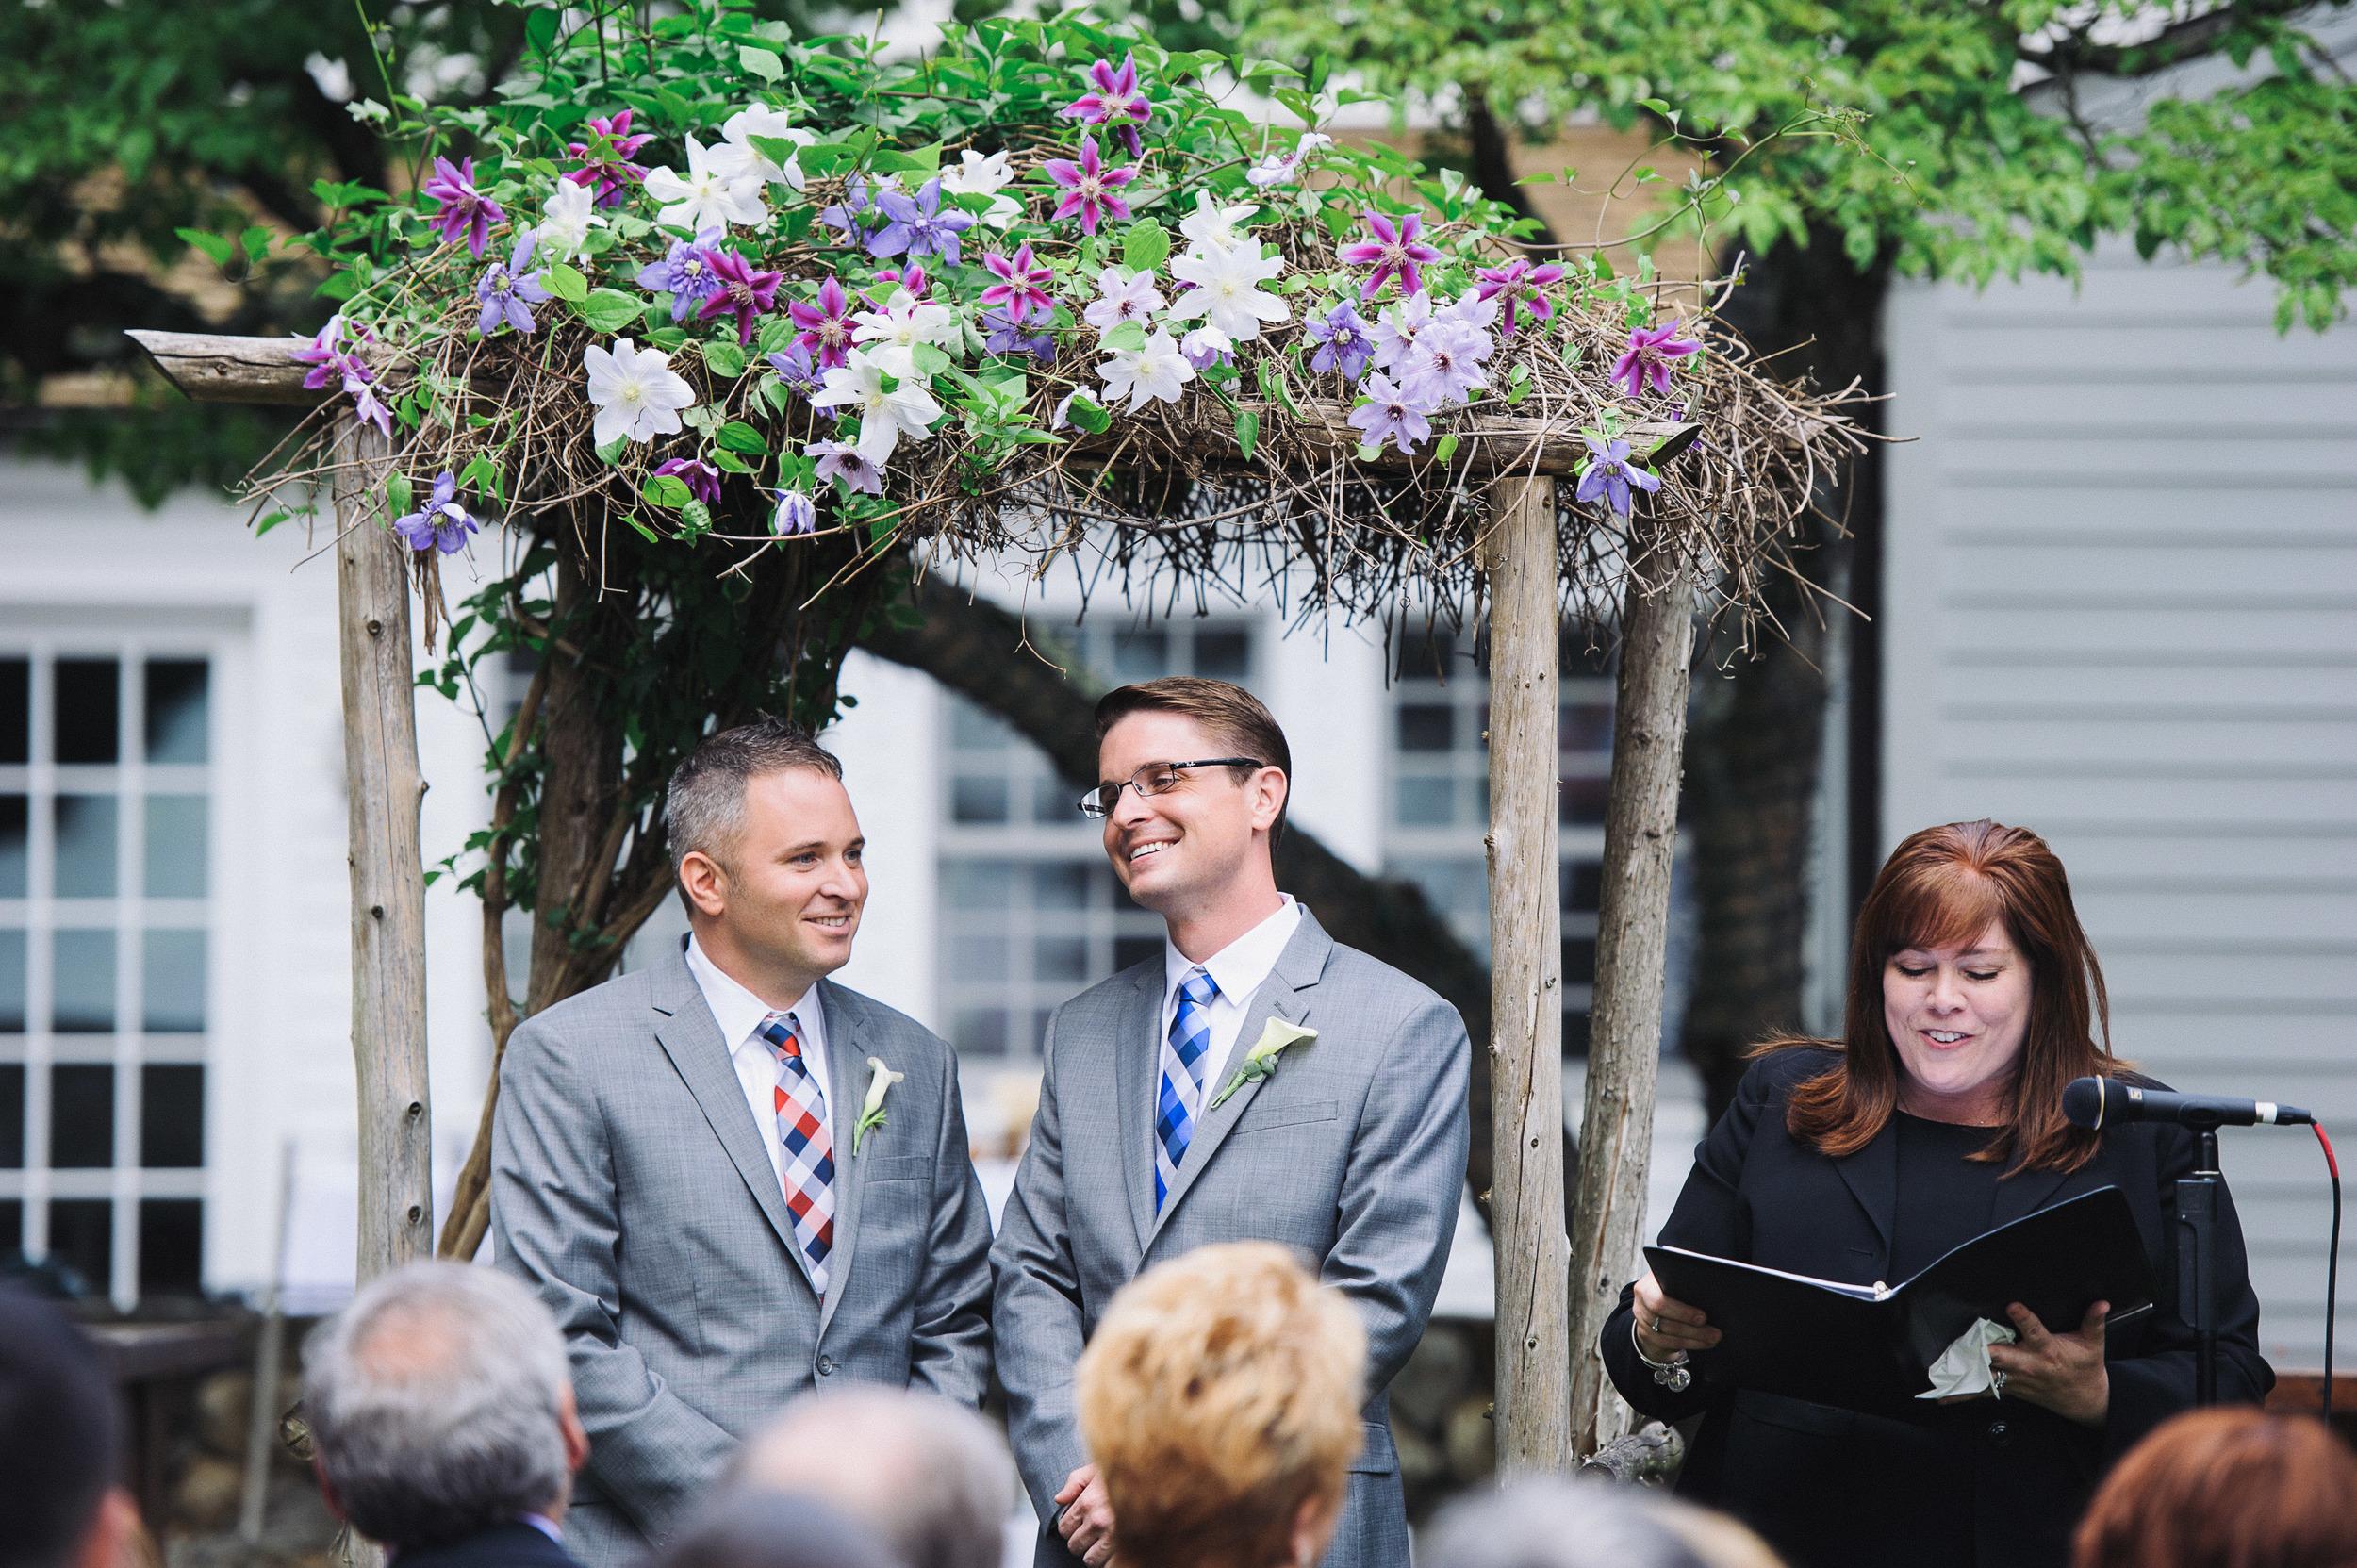 Same Sex Wedding CT Gay Wedding LGBT Wedding057.JPG